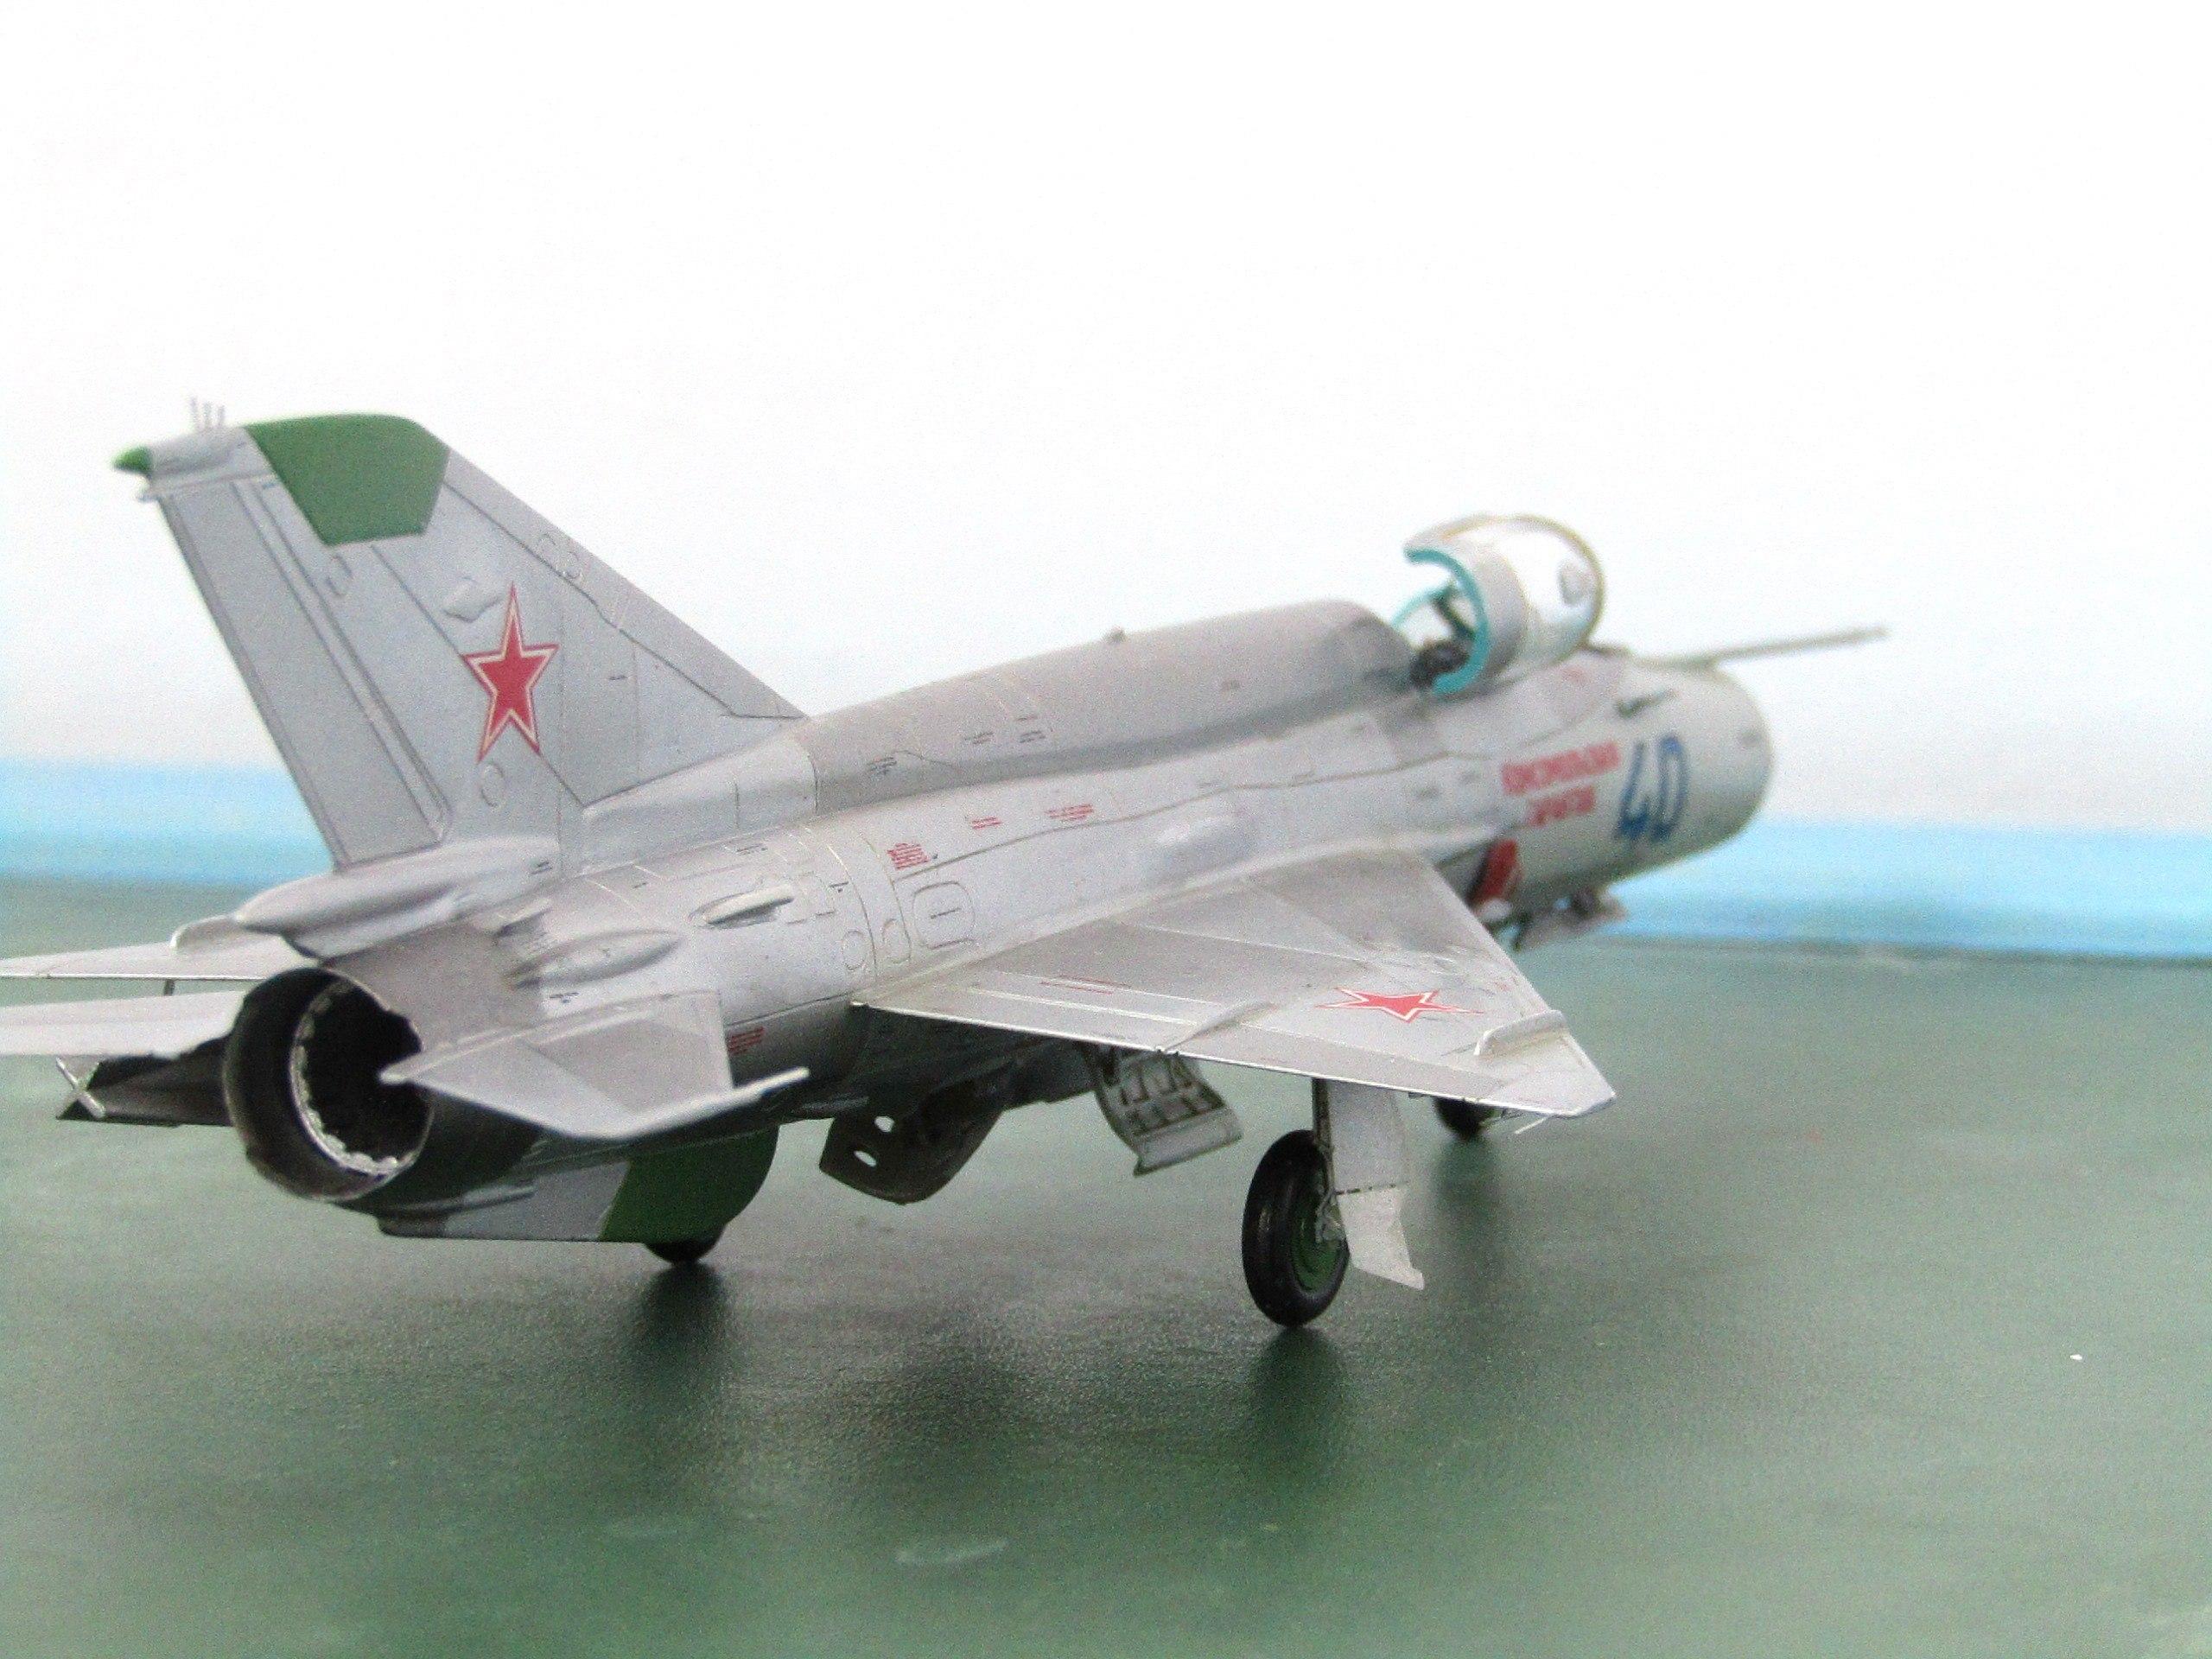 МиГ-21БИС 1/72 (Звезда) 9AsaFqD08Rg